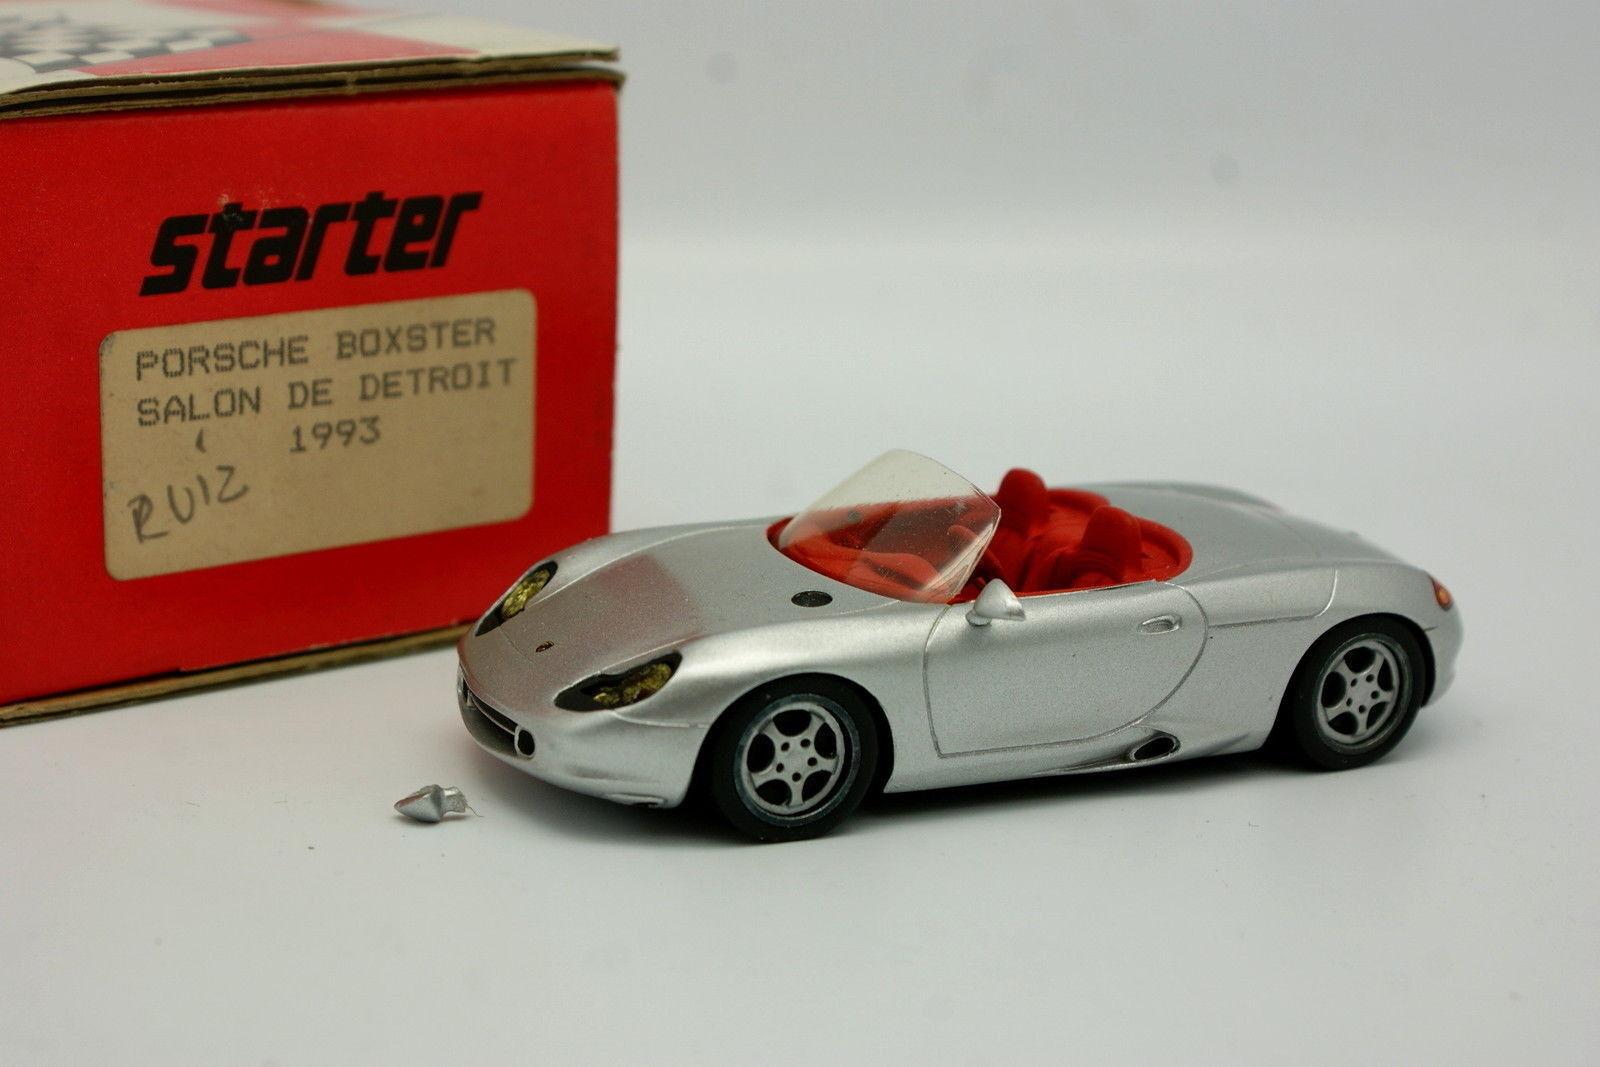 Starter 1 43 - Porsche Boxster Salon Detroit 1993